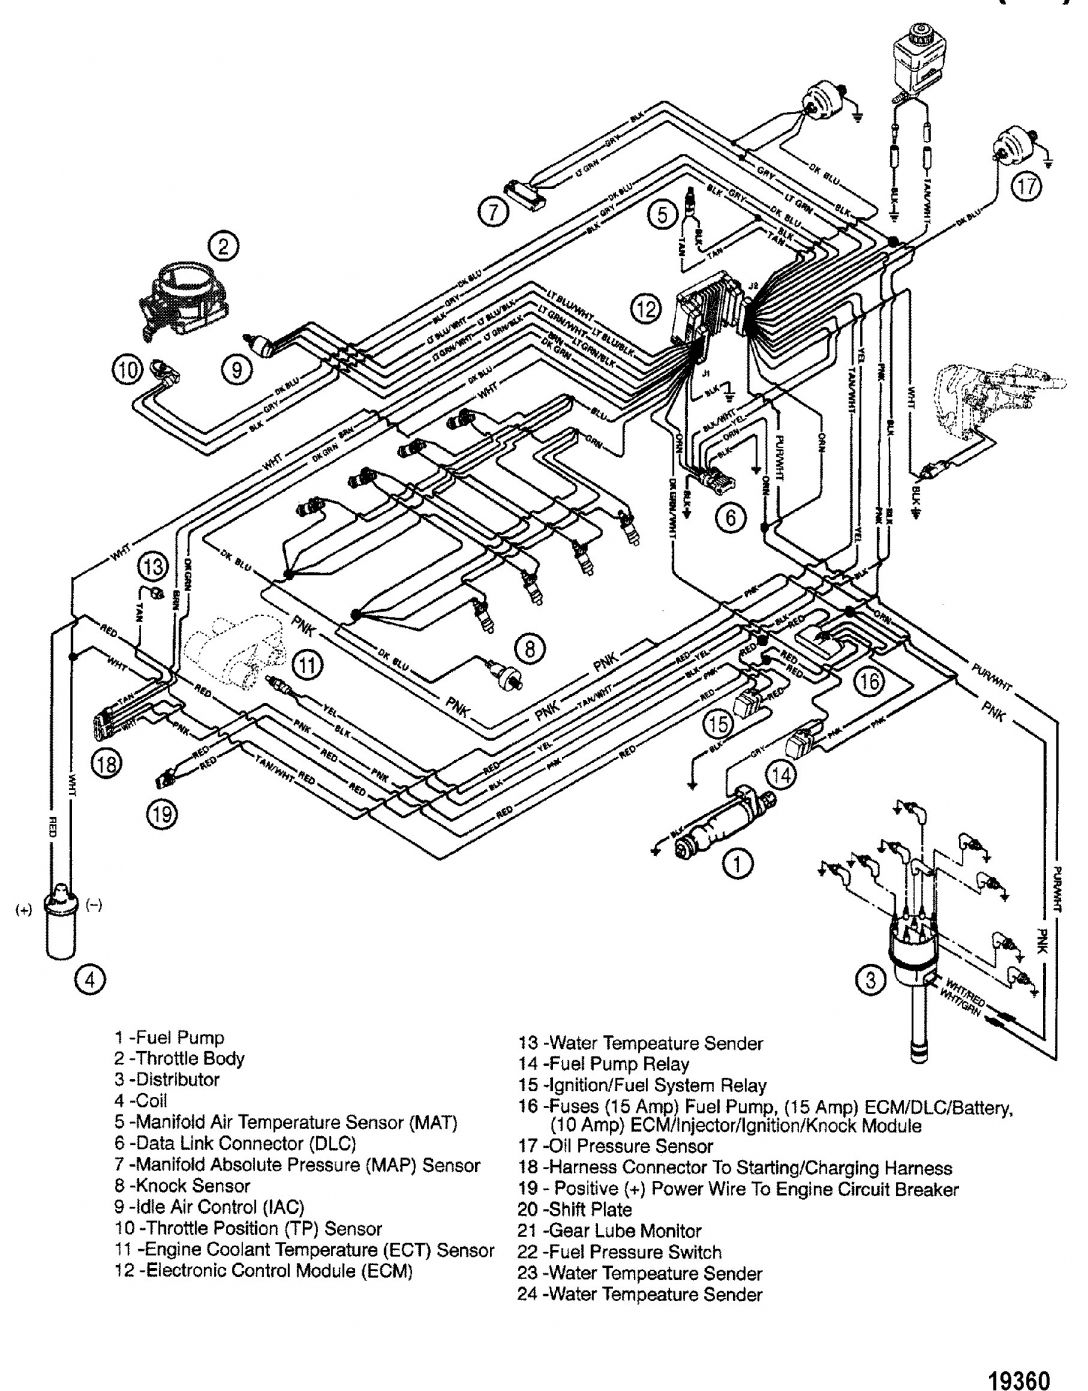 Mercruiser 140 Engine Wiring Diagram And Mercruiser Engine